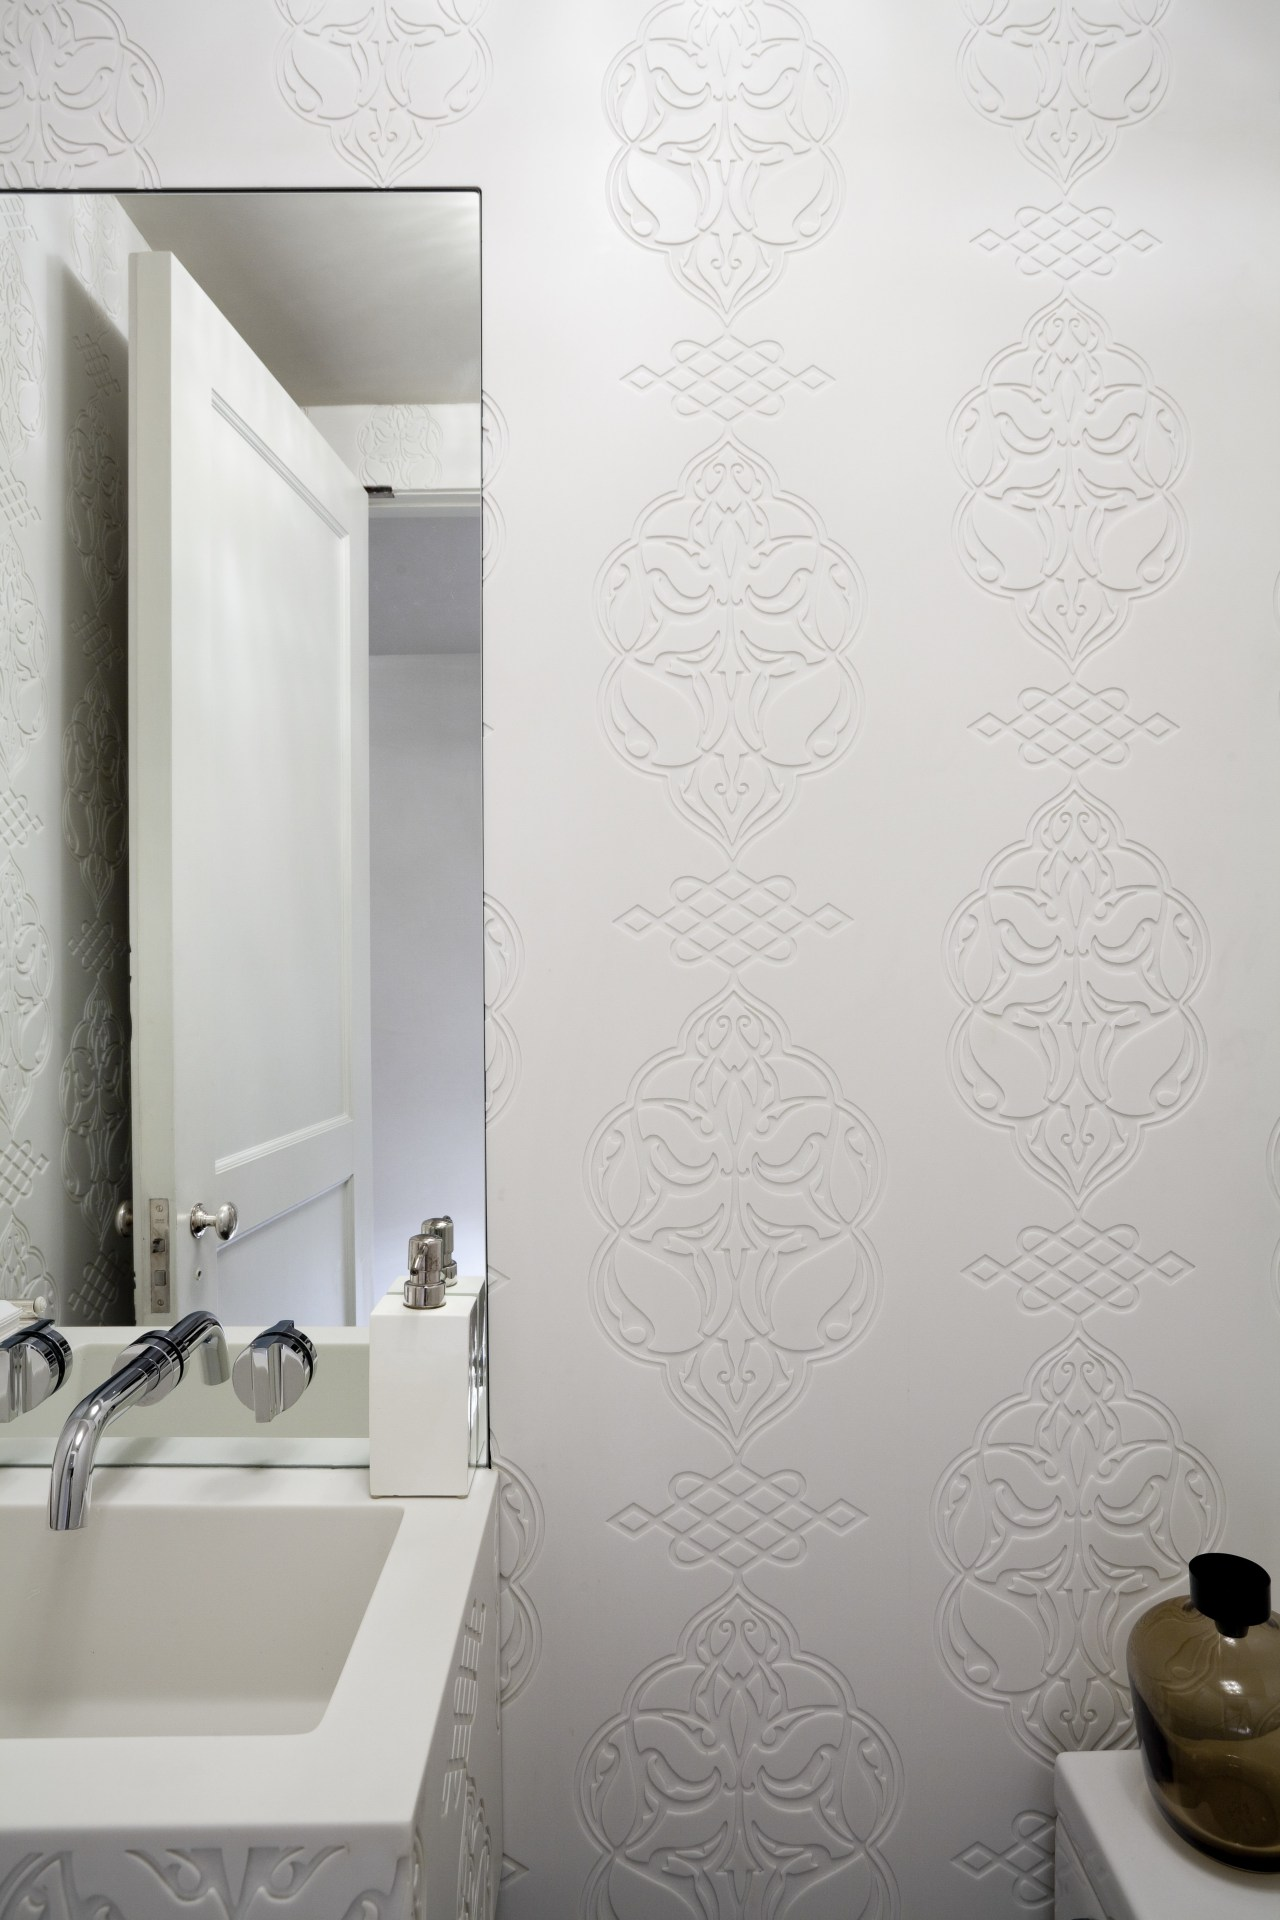 Custom-designed and fabricated Glacier White Corian clads every bathroom, ceramic, floor, flooring, interior design, plaster, plumbing fixture, product design, room, tap, tile, wall, white, gray